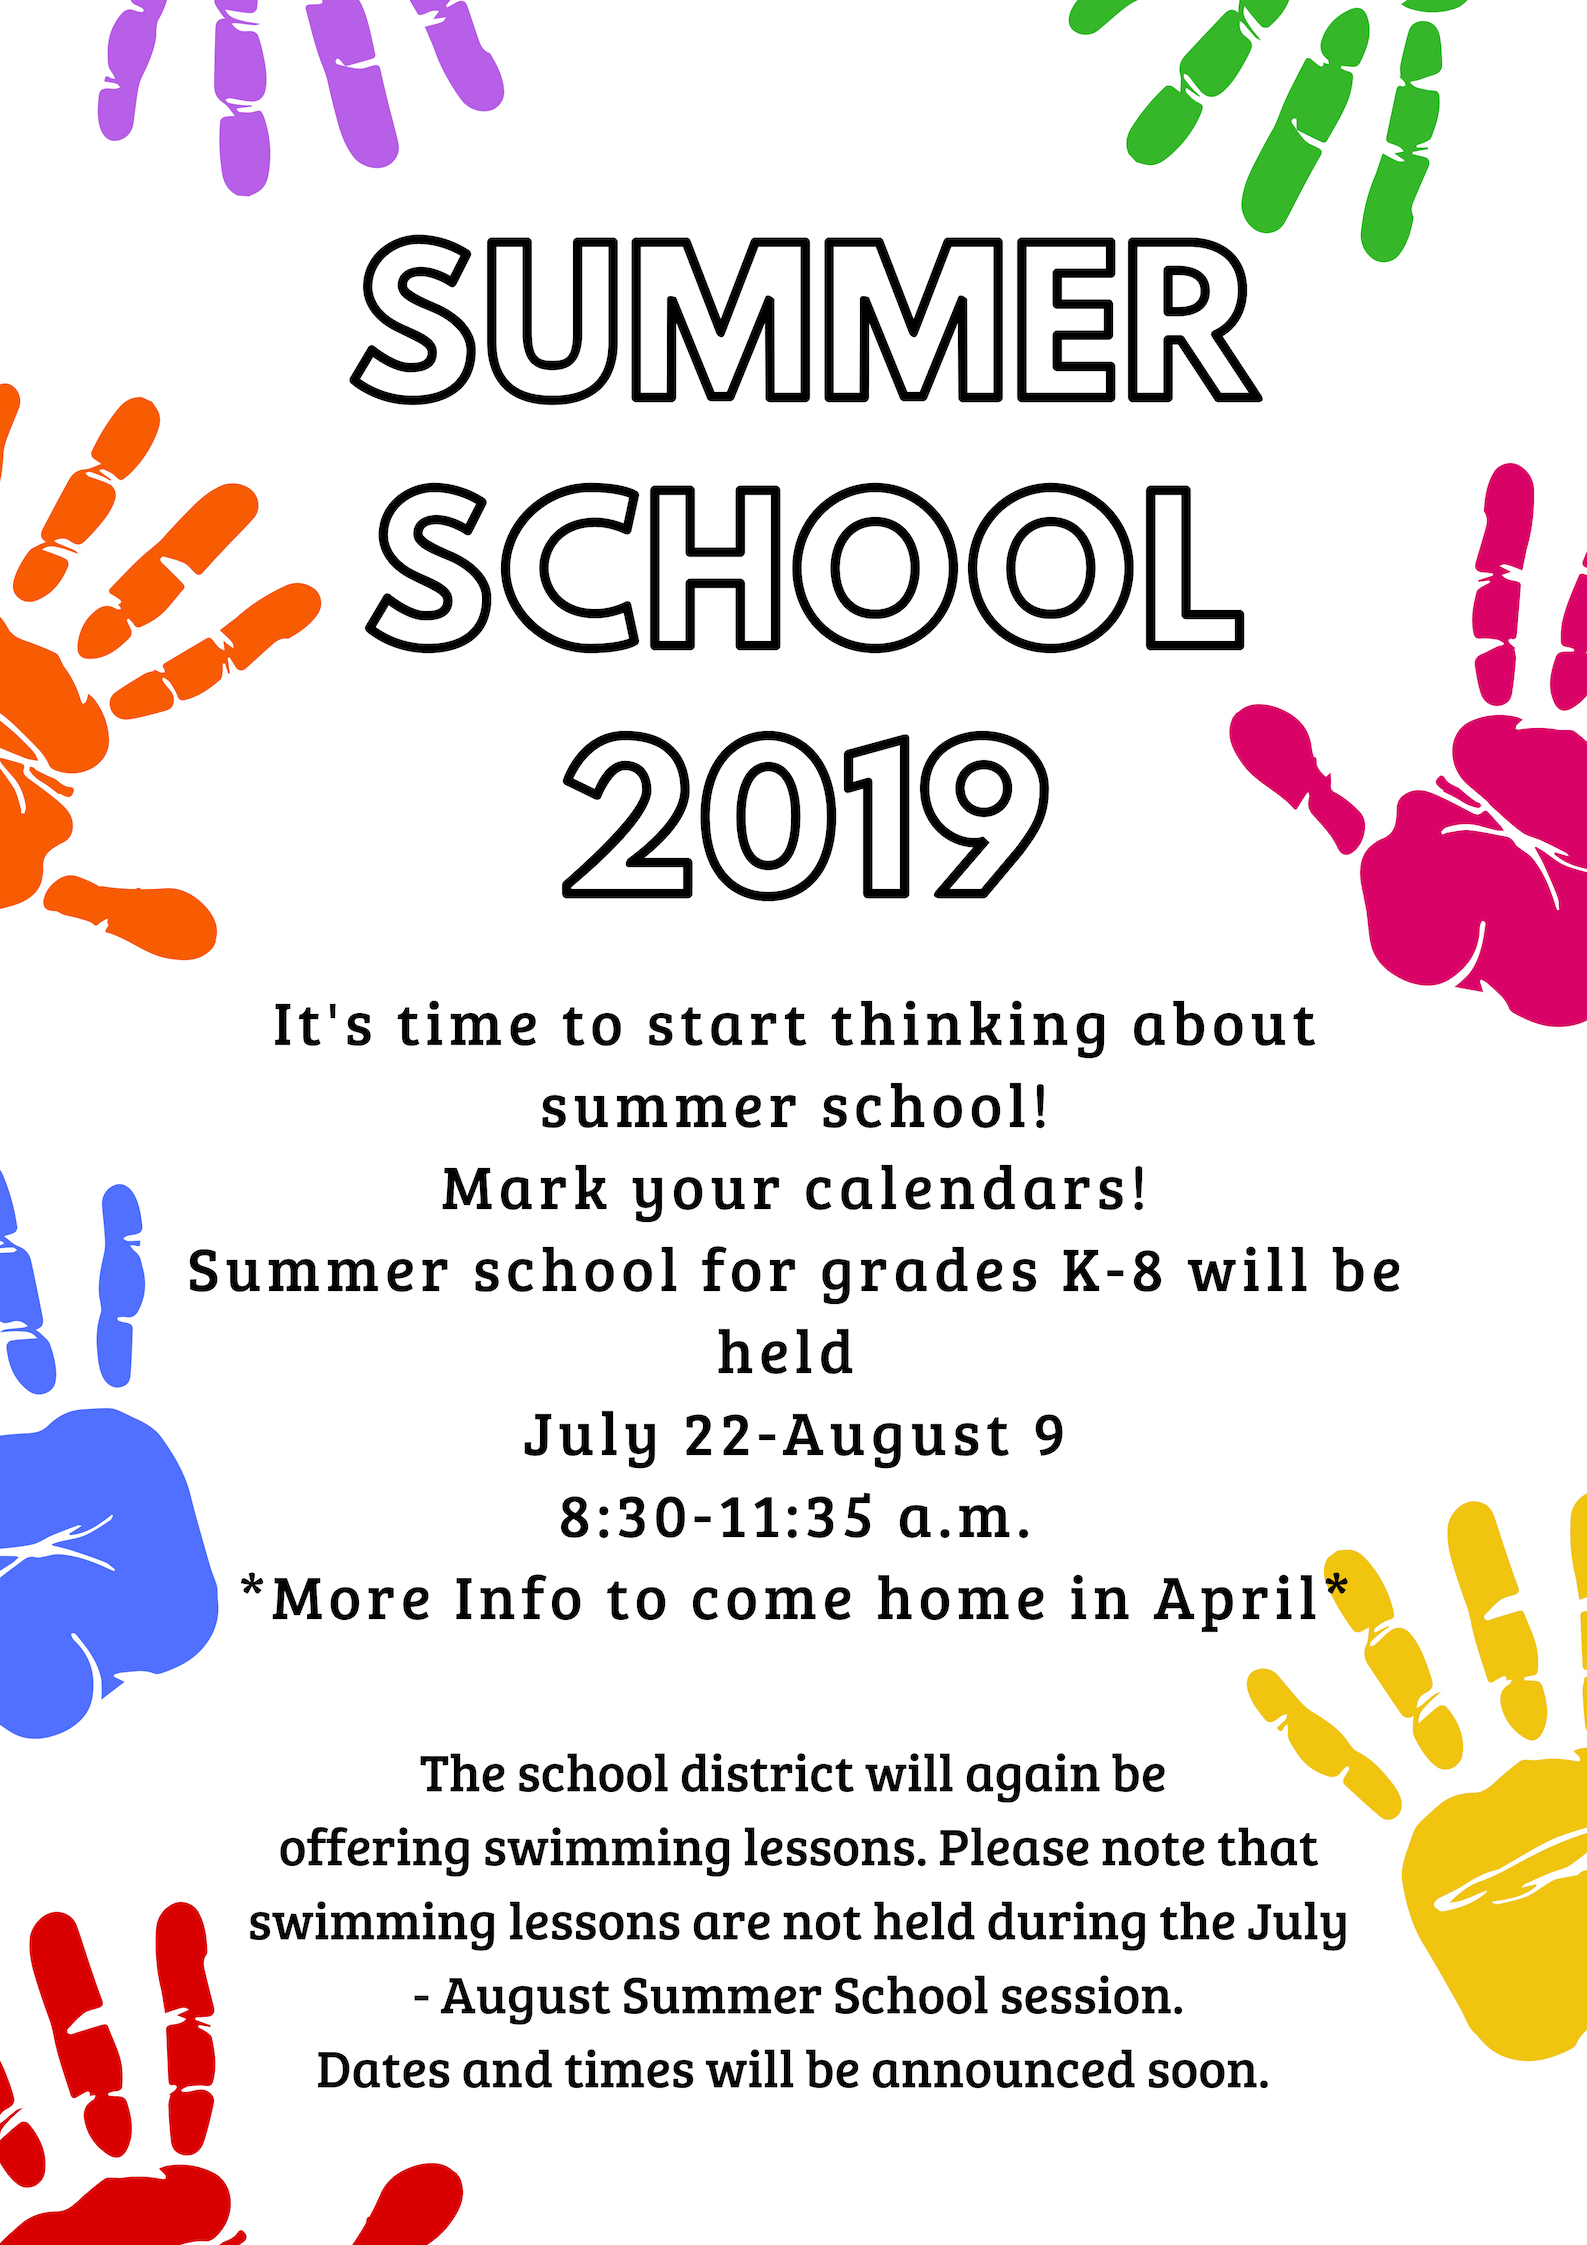 2019 Summer School Dates - News - School District of West Salem